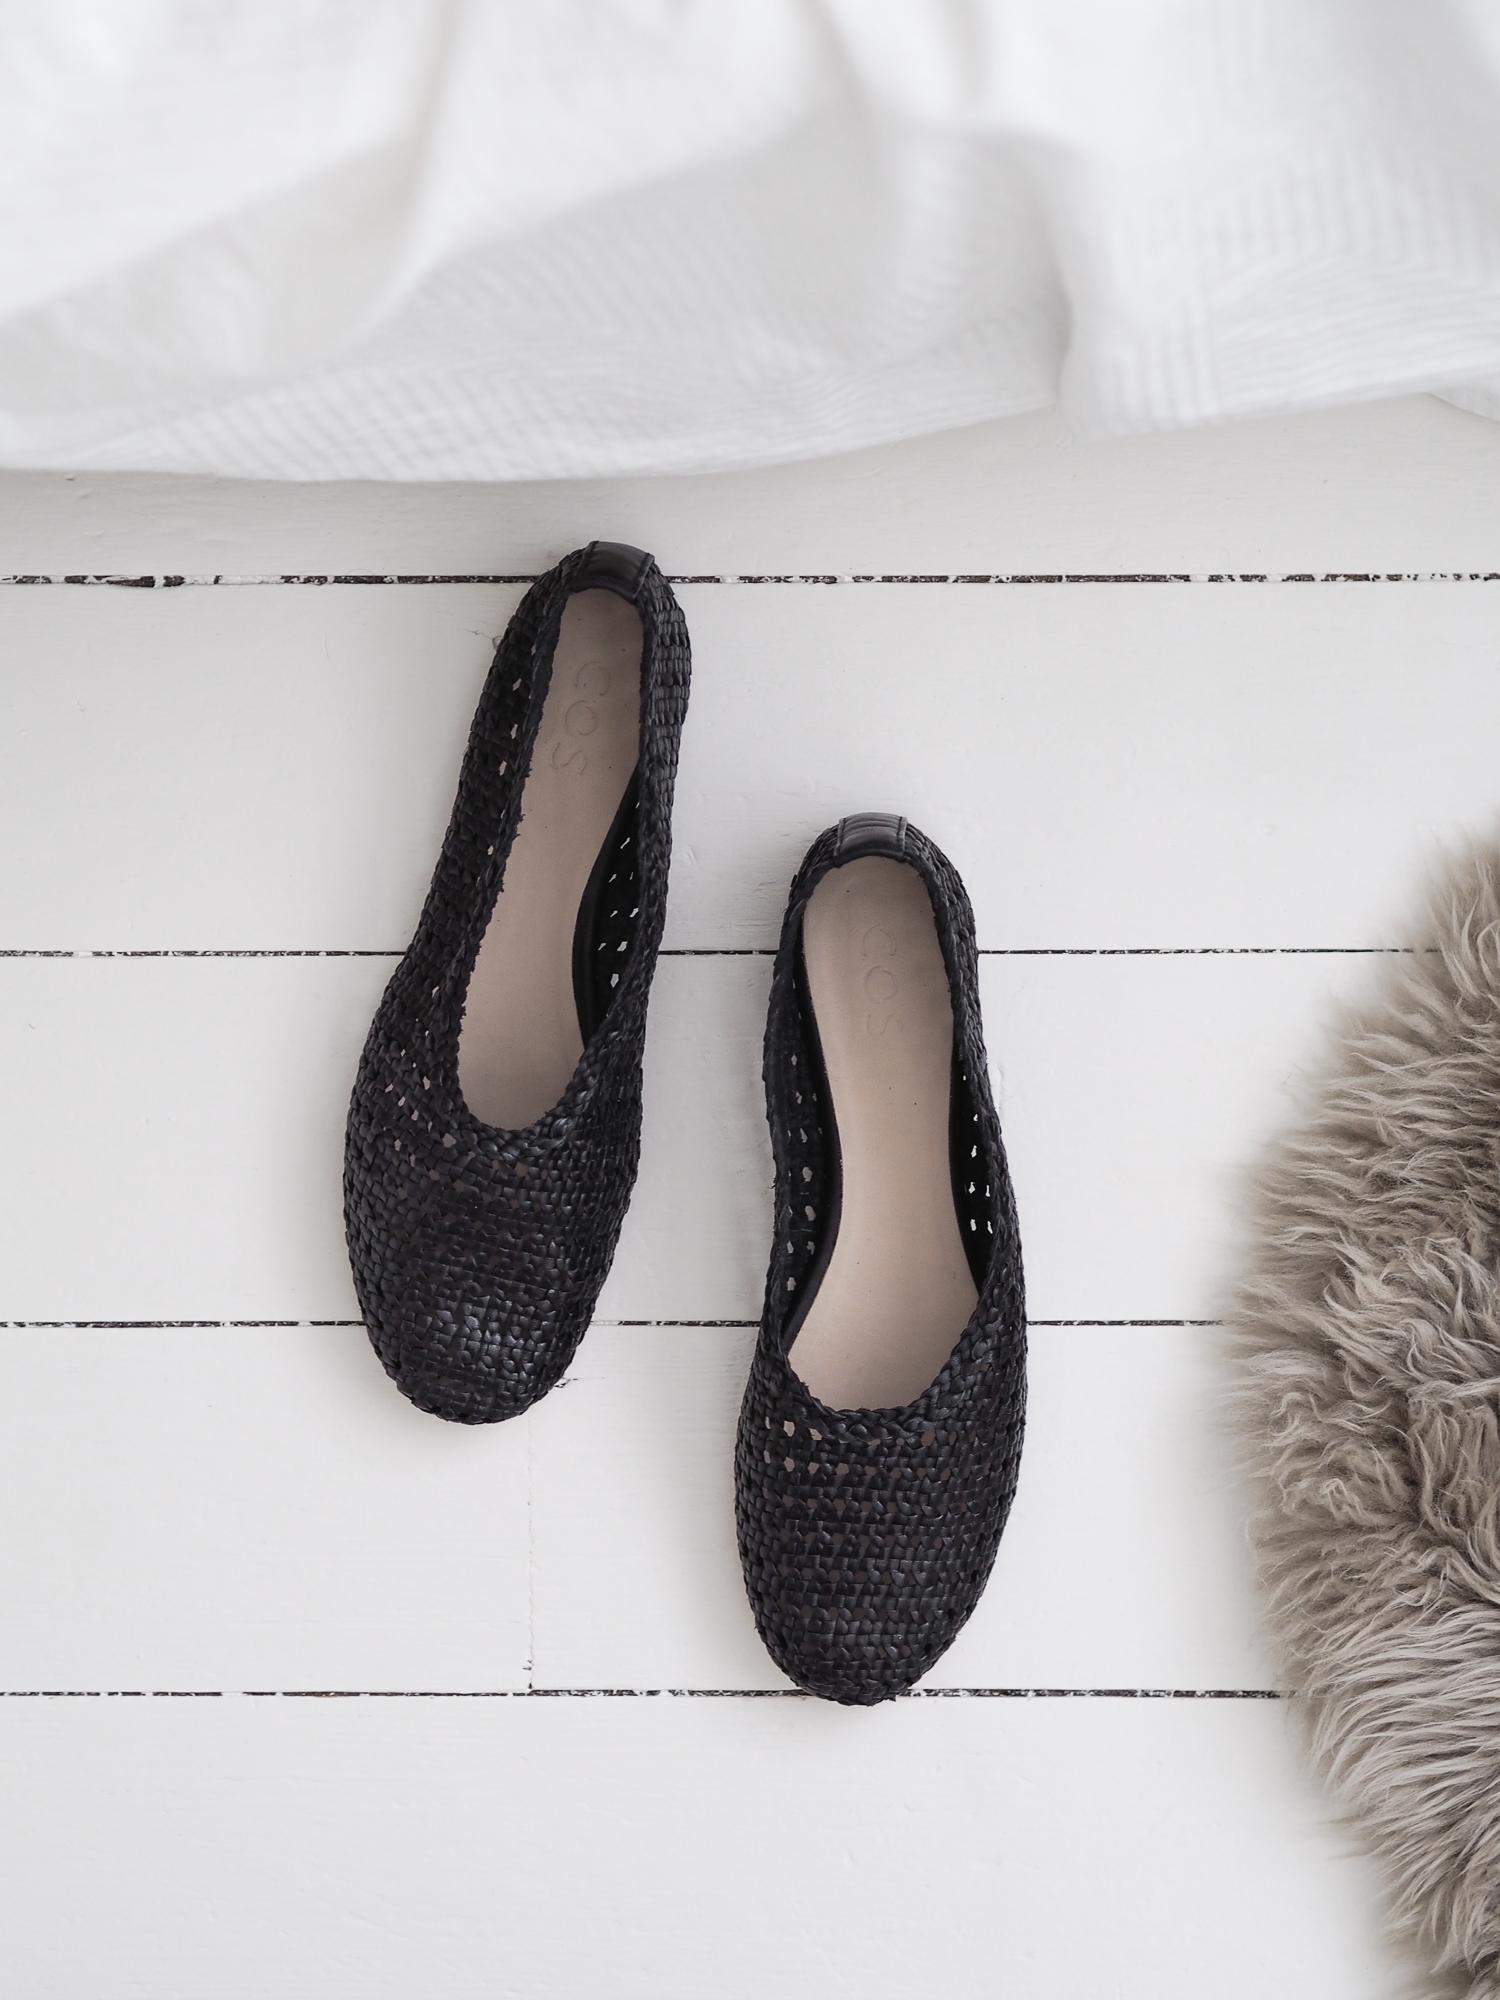 Cos shoes | Design Hunter